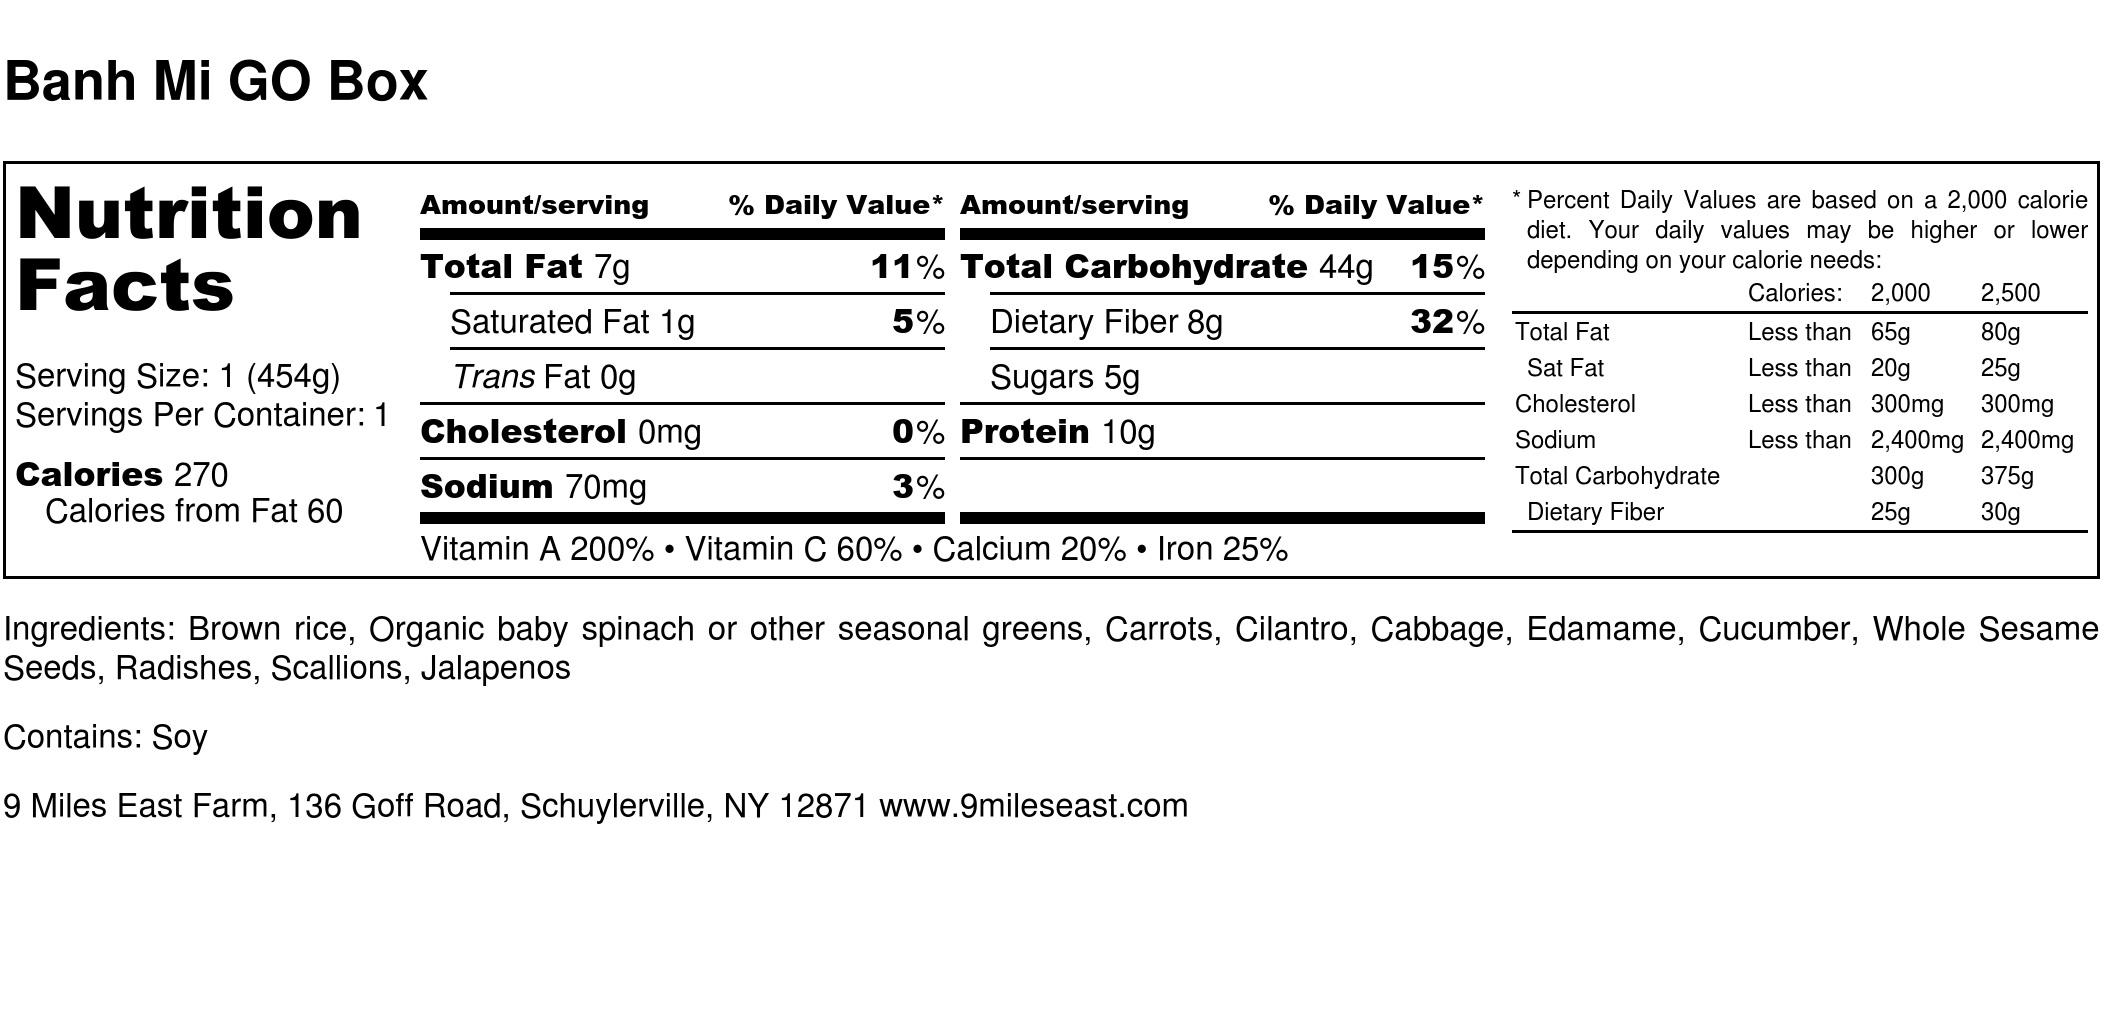 Banh Mi GO Box - Nutrition Label.jpg